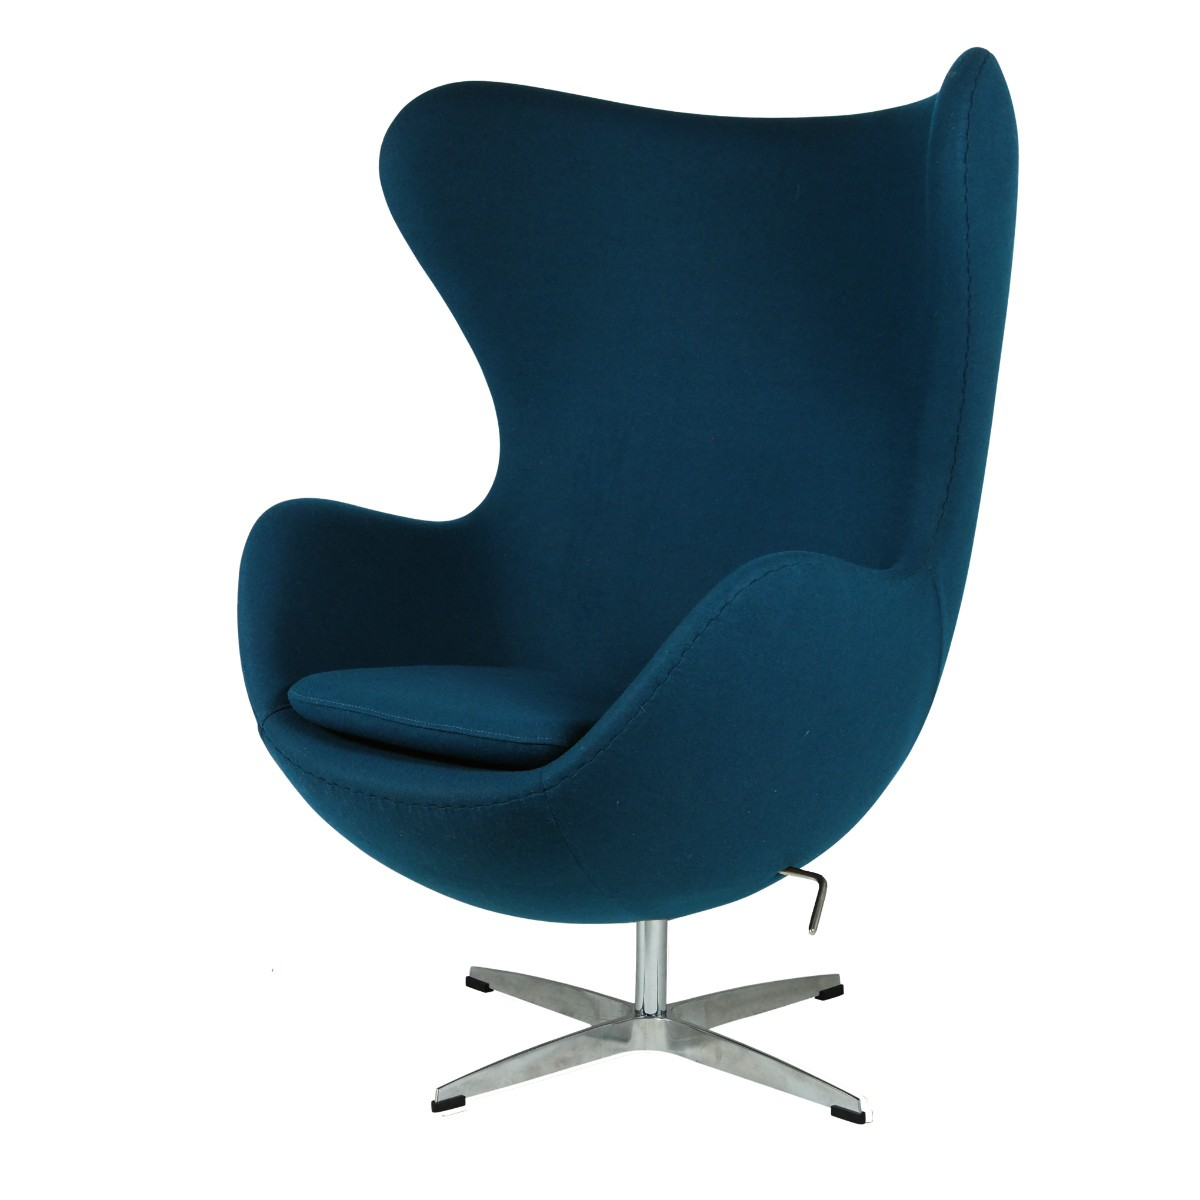 Arne Jacobsen Lounge Chair Egg Chair Blue